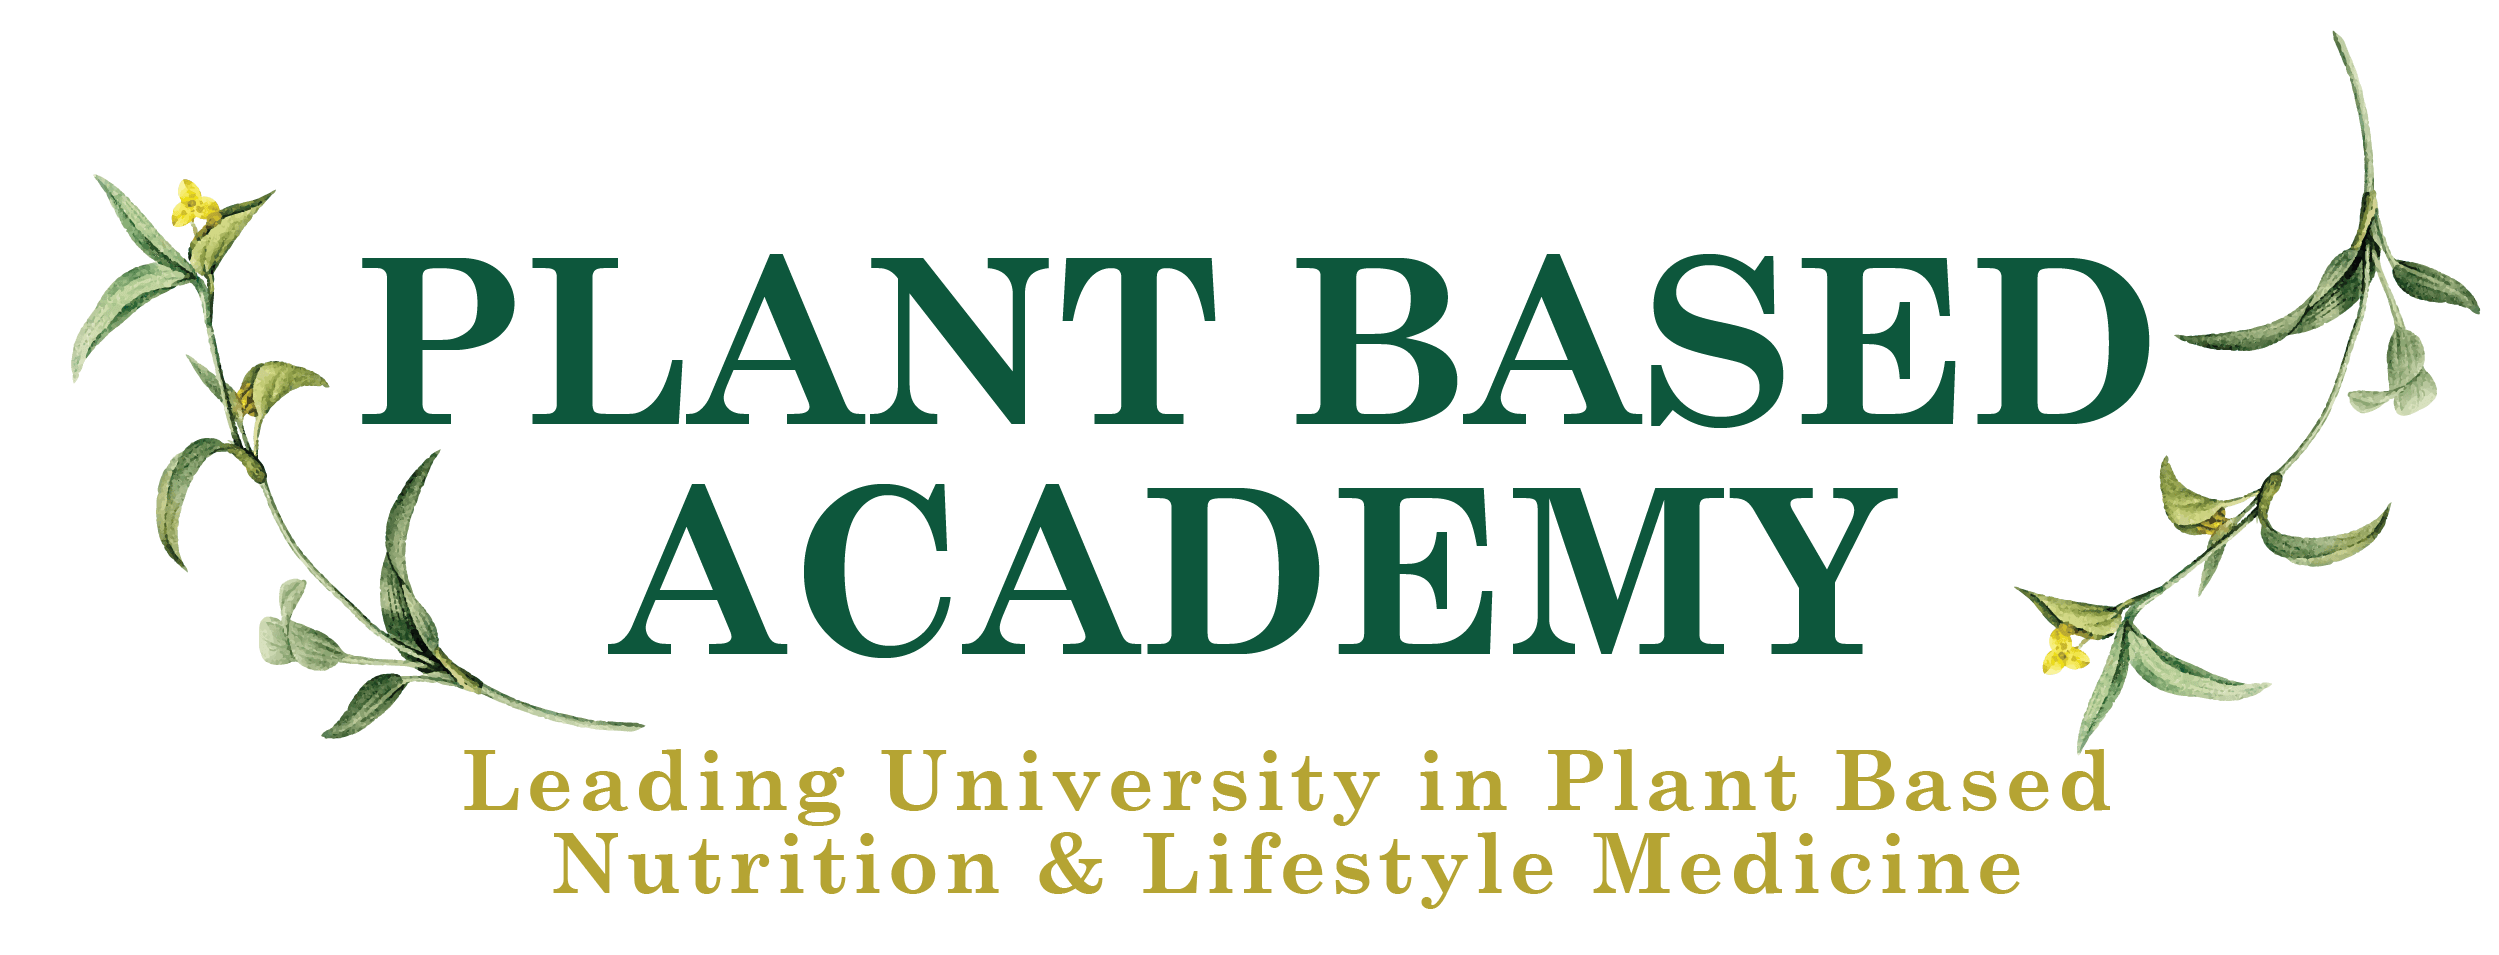 Plant Based Academy